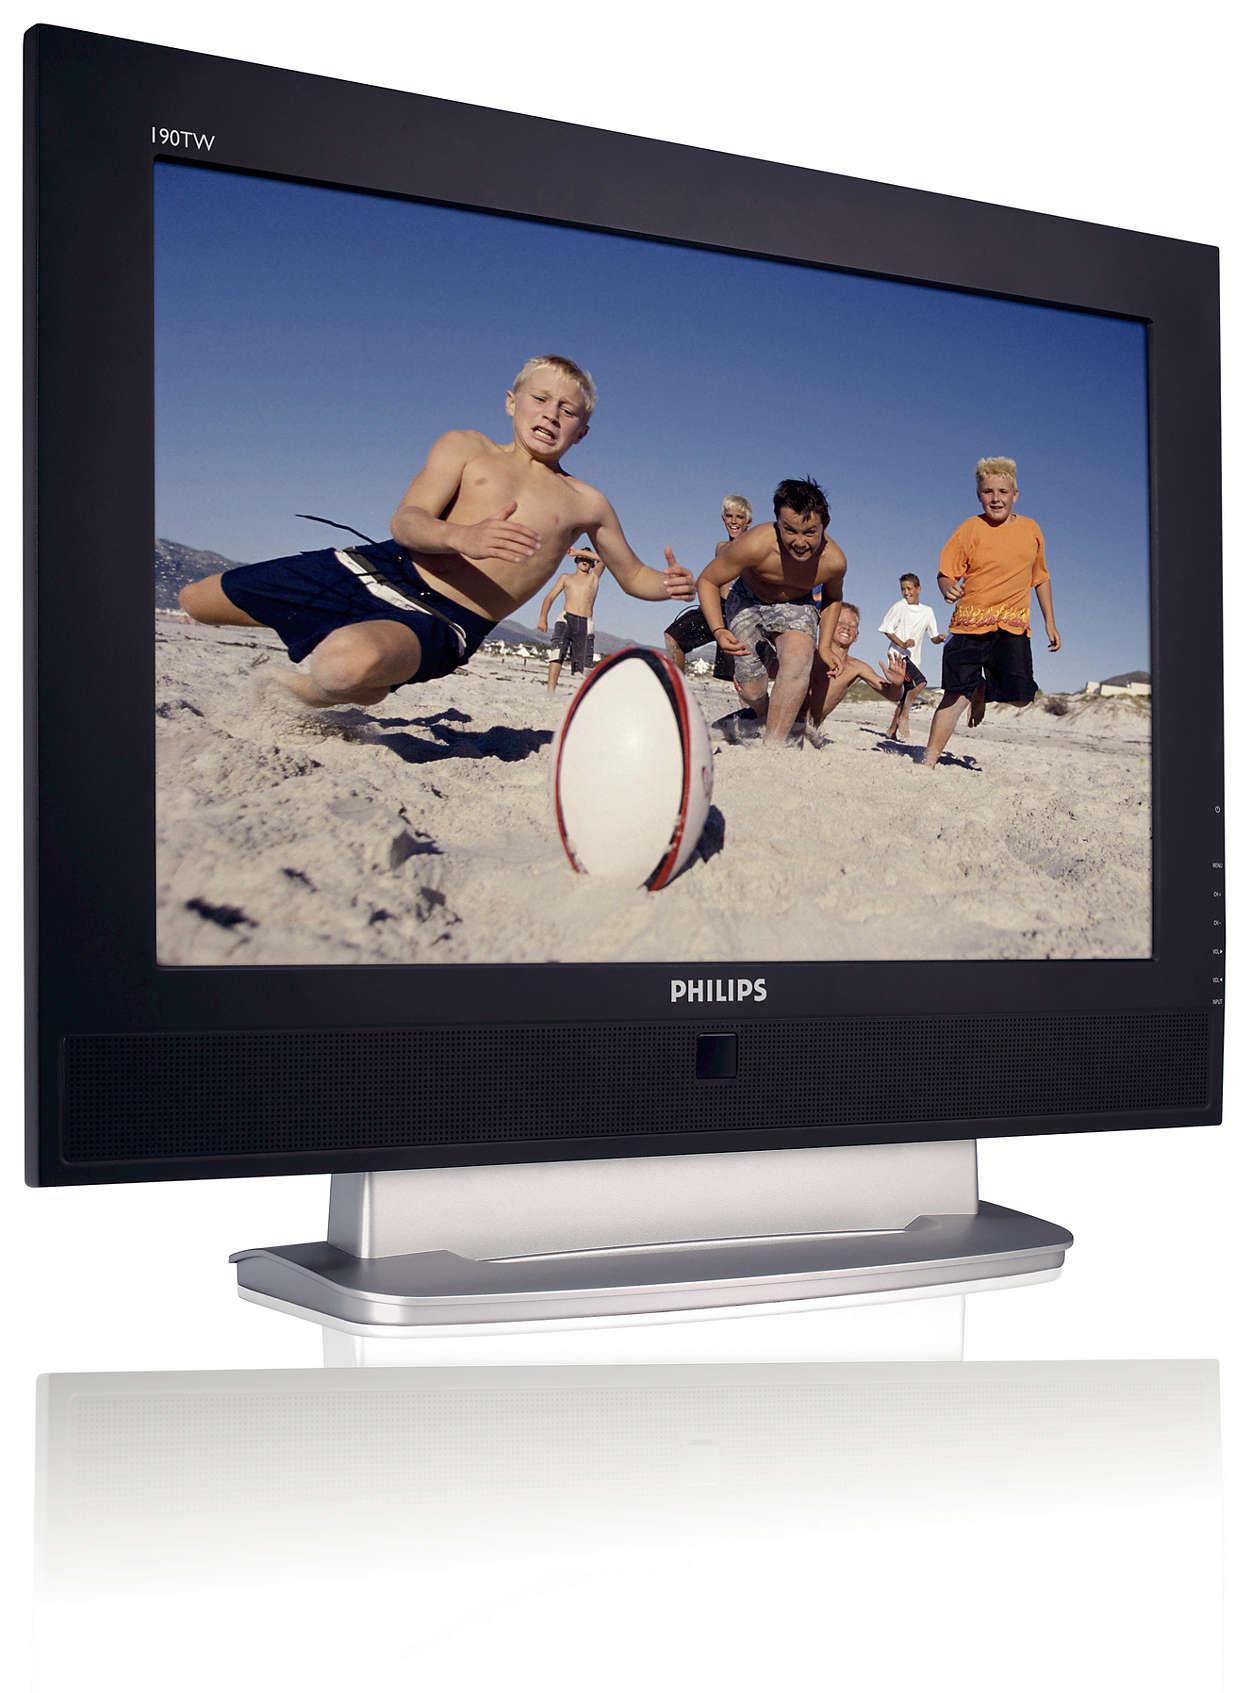 Tam özelikli LCD monitör ve TV bir arada